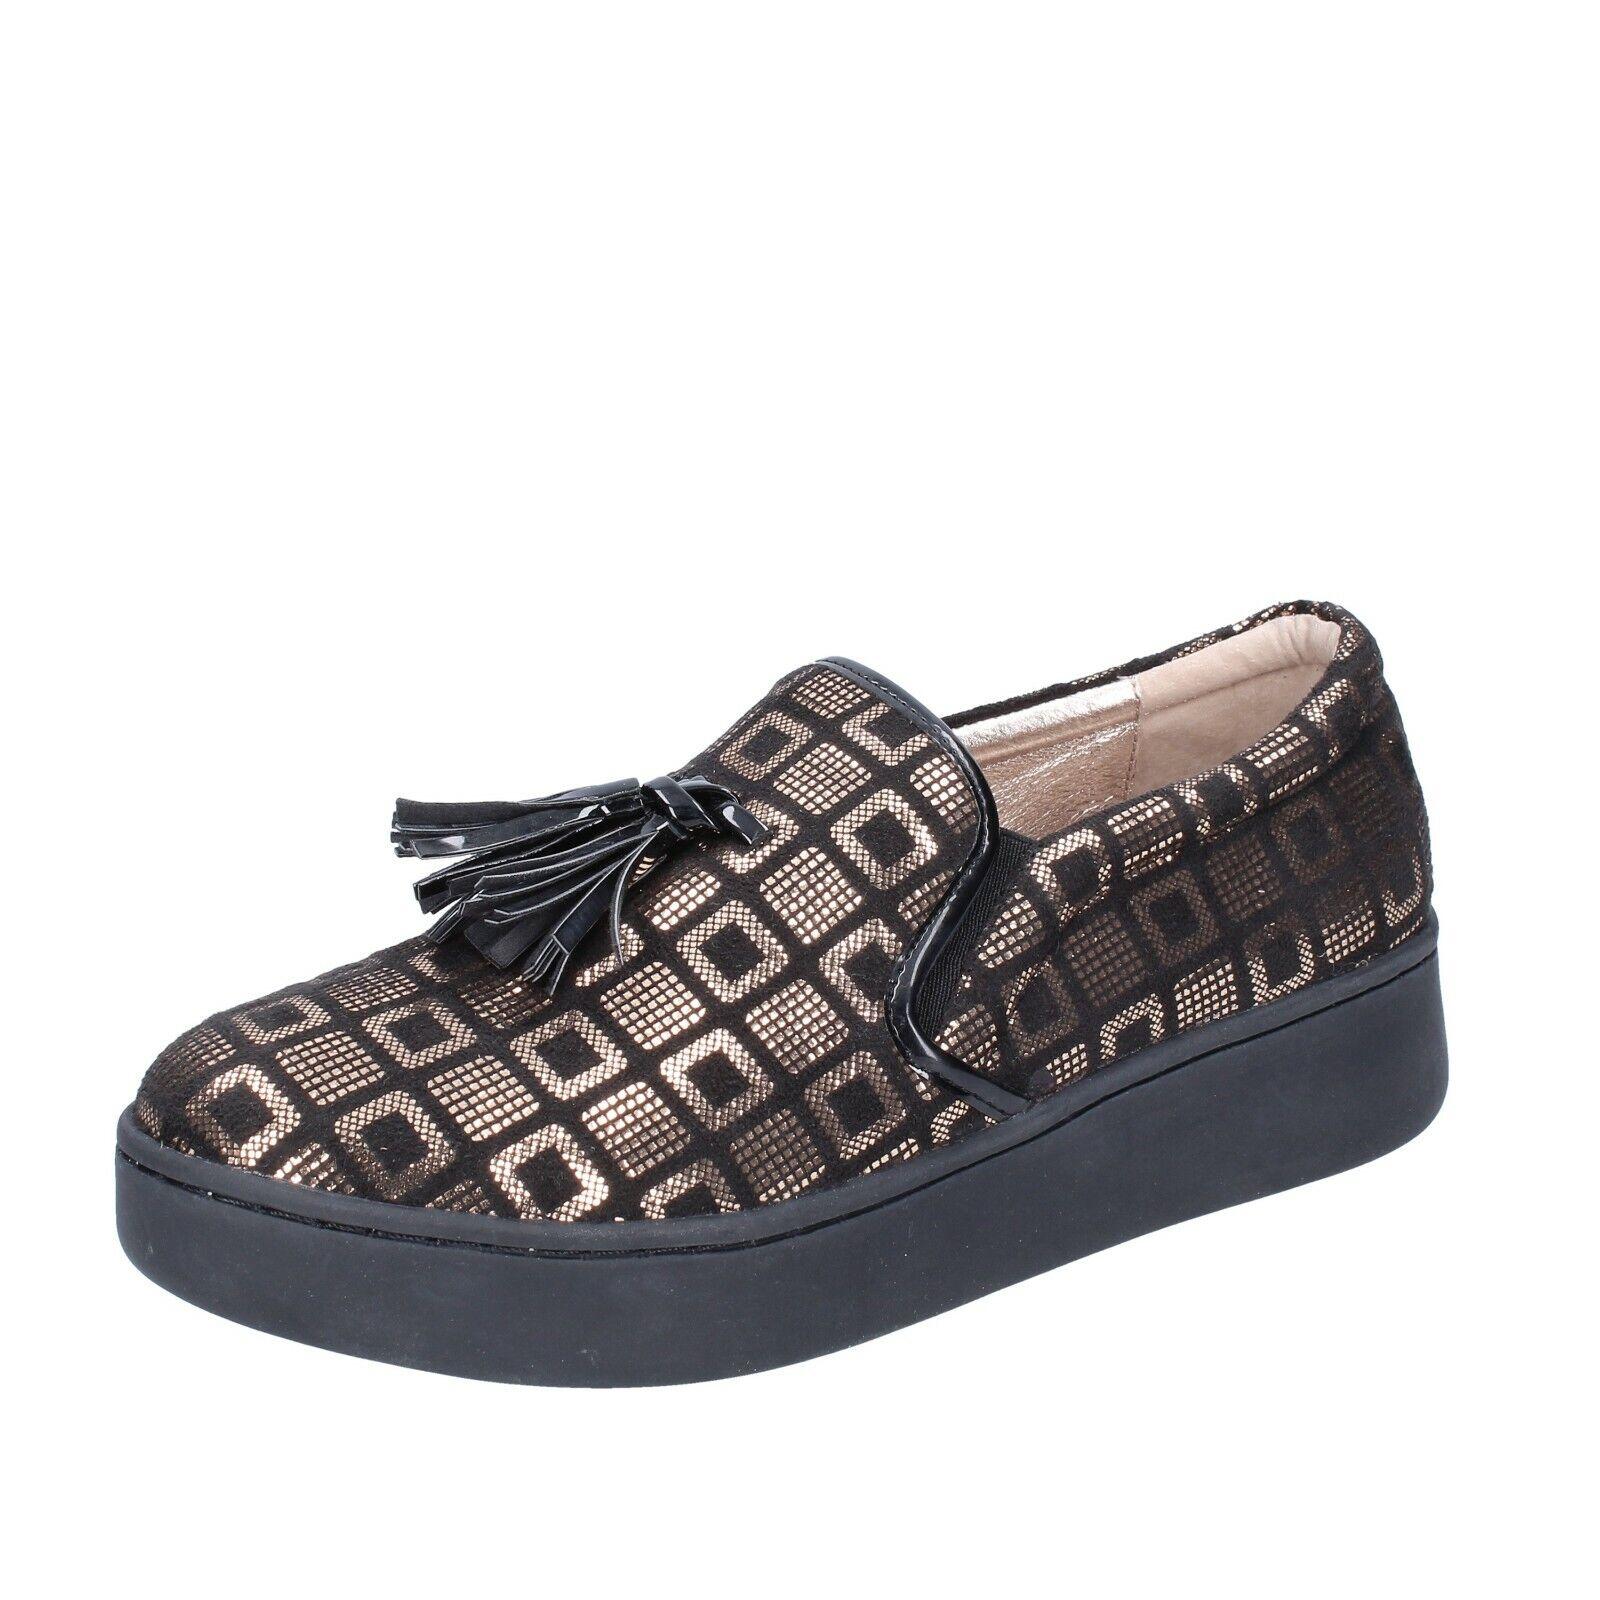 Zapatos señora Uma Parker 36 UE slip on oro negro de gamuza br53-36